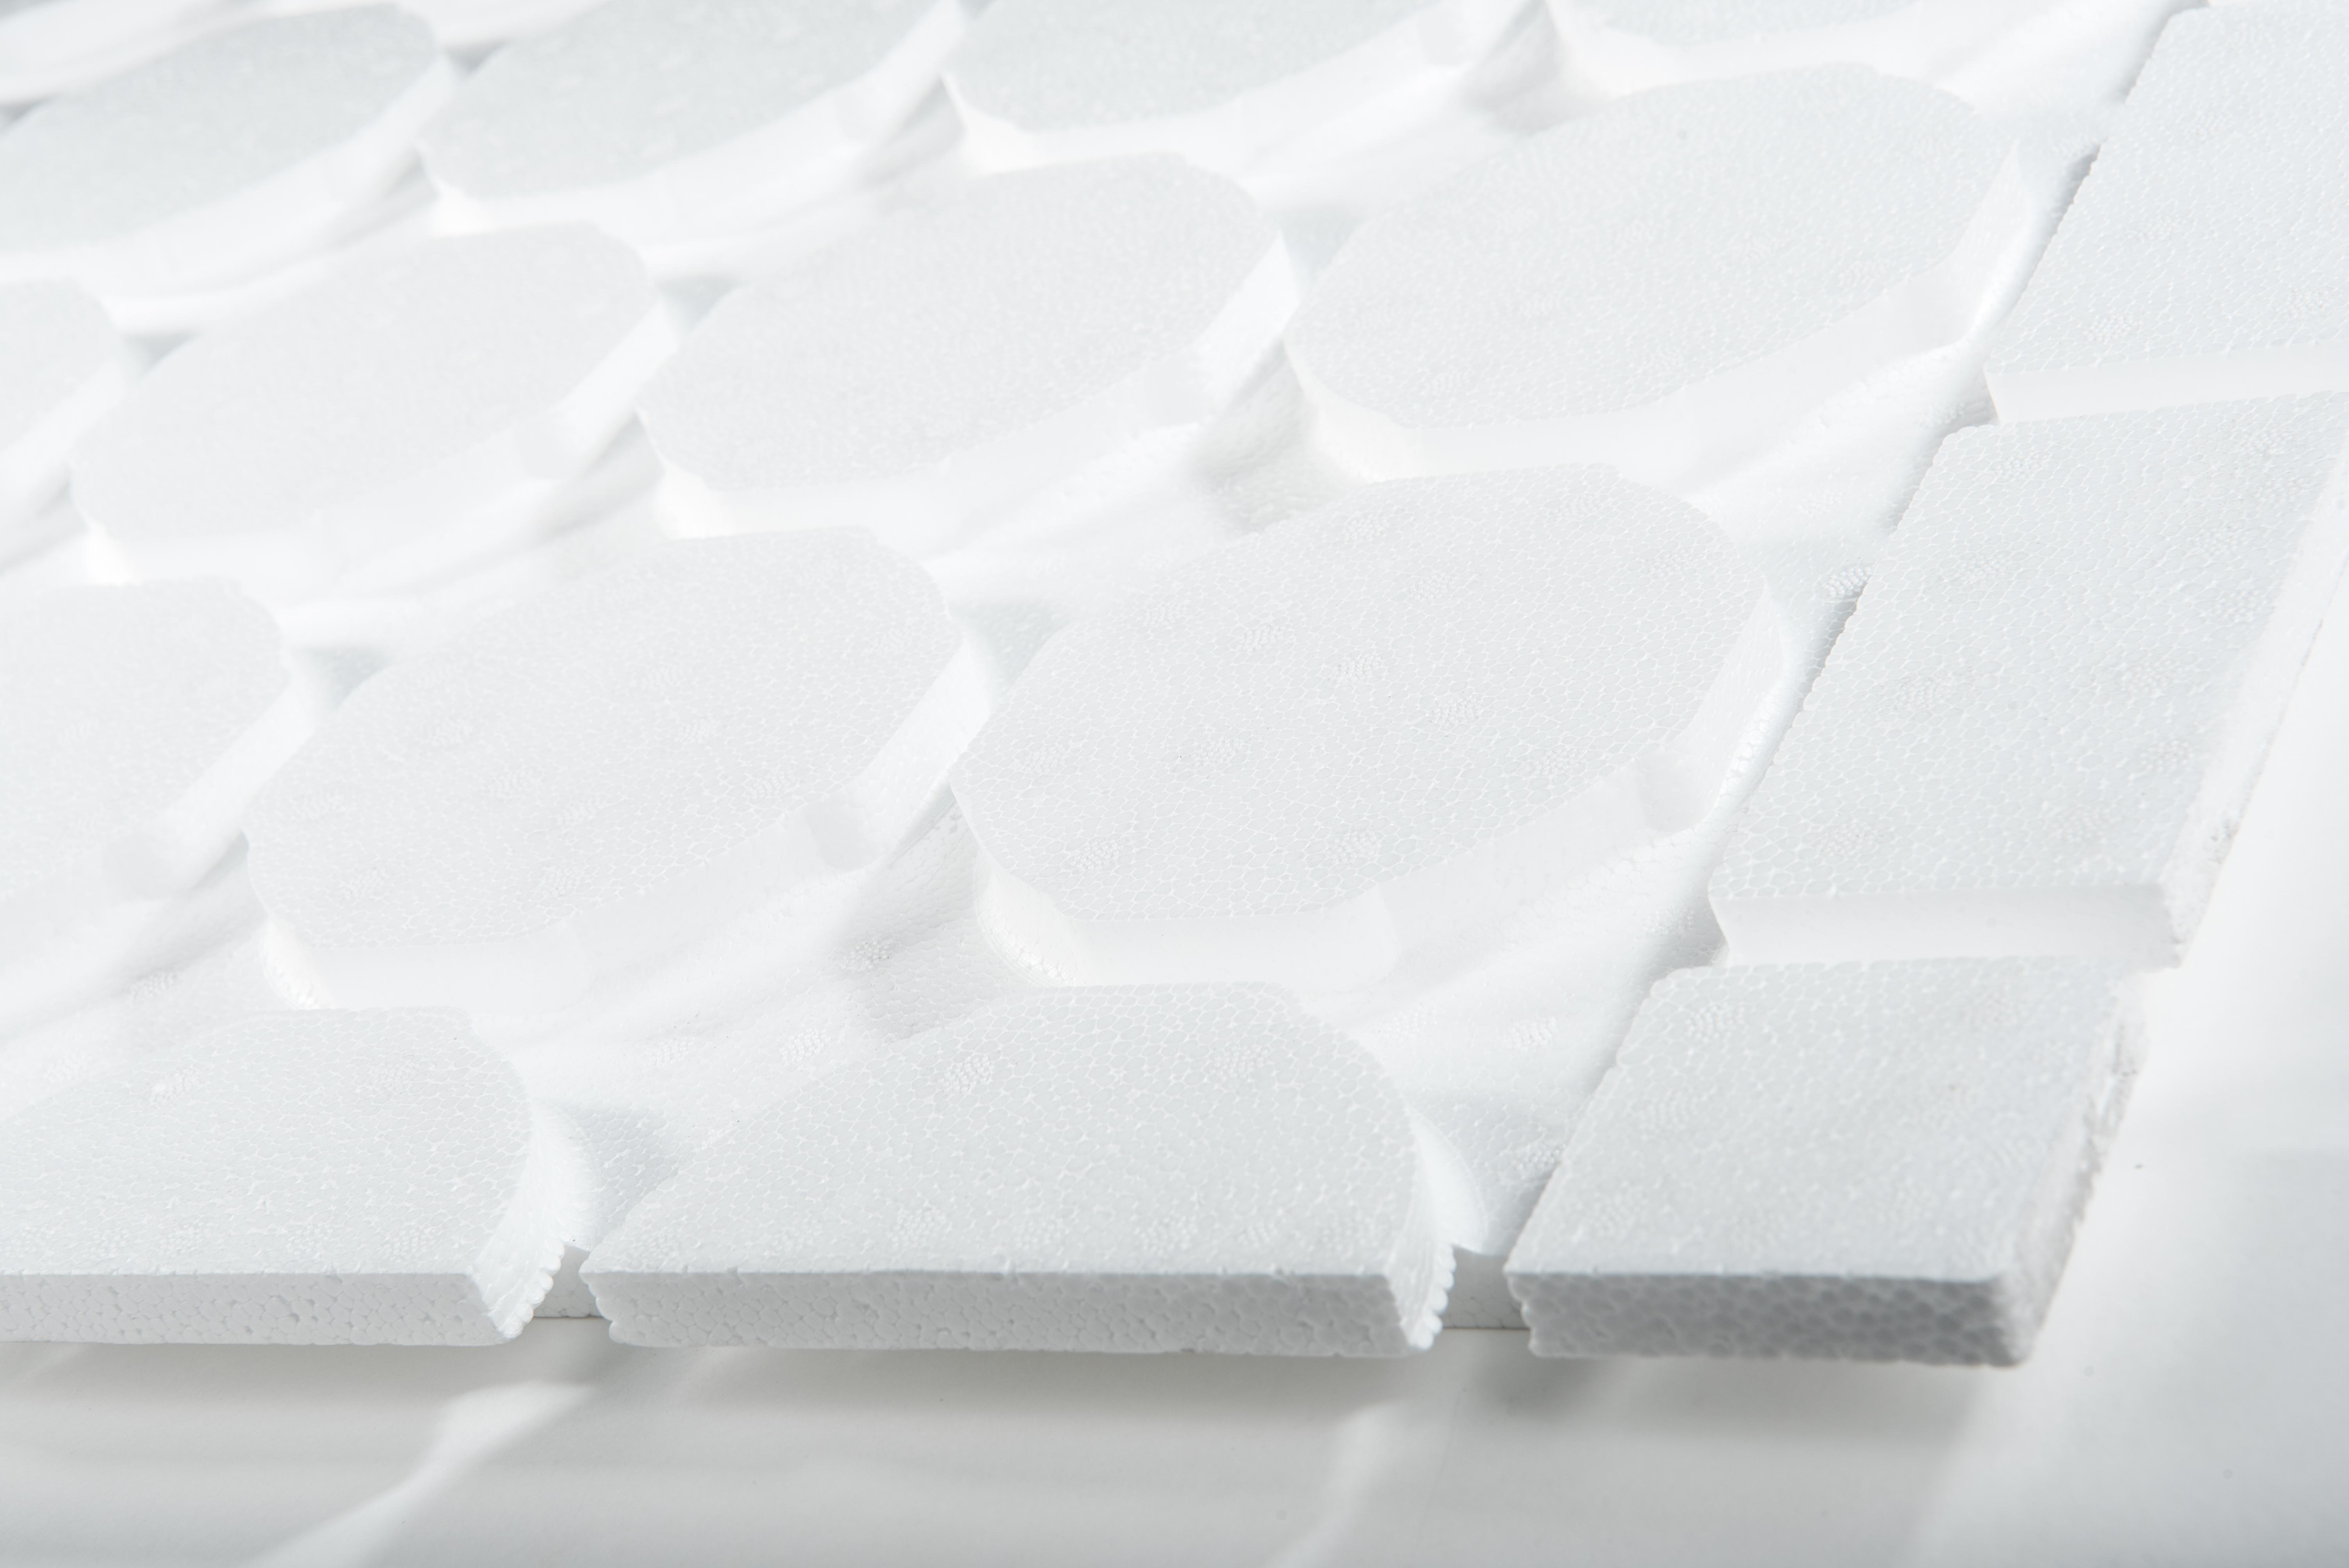 trockenestrichsystem f r fu bodenheizung fussbodenheizungdirekt online shop. Black Bedroom Furniture Sets. Home Design Ideas